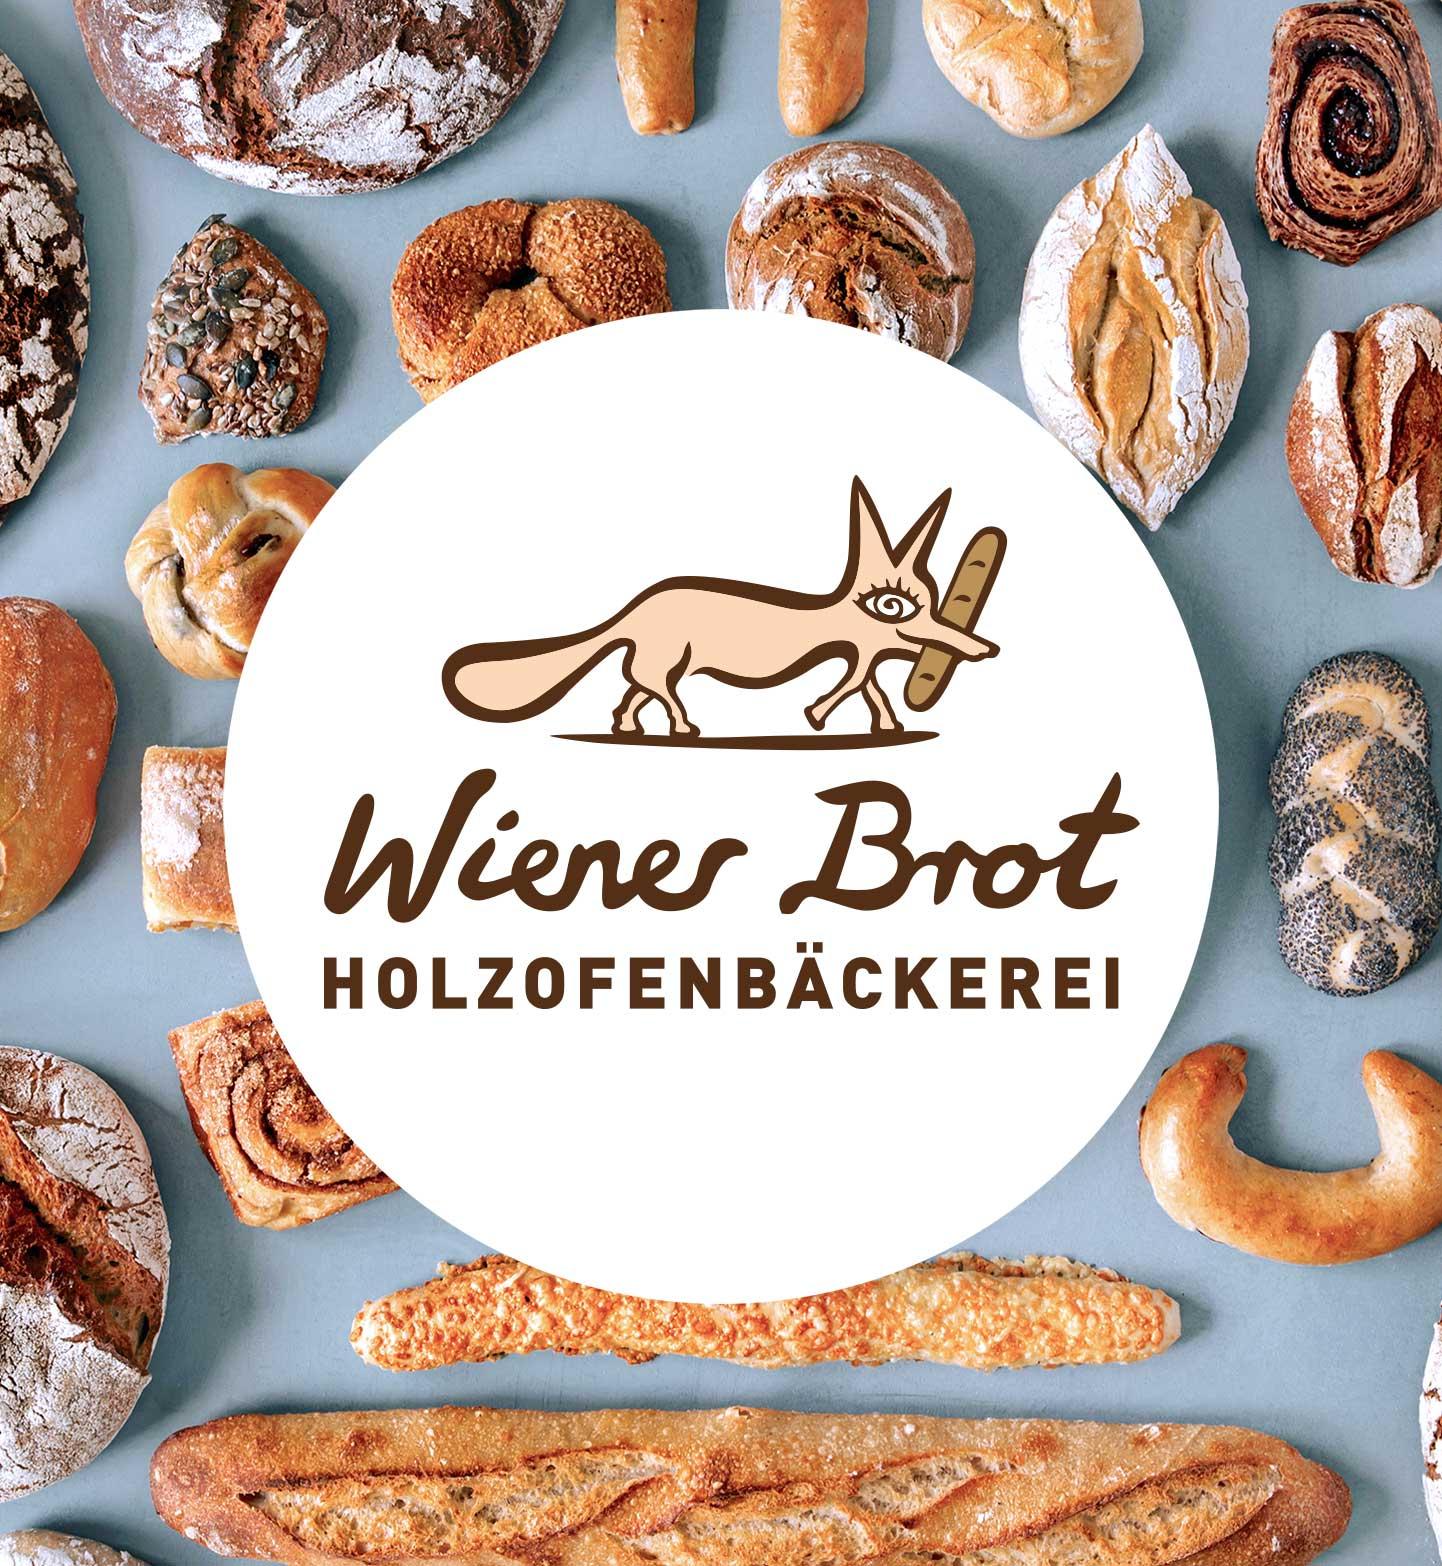 Wienerbrot